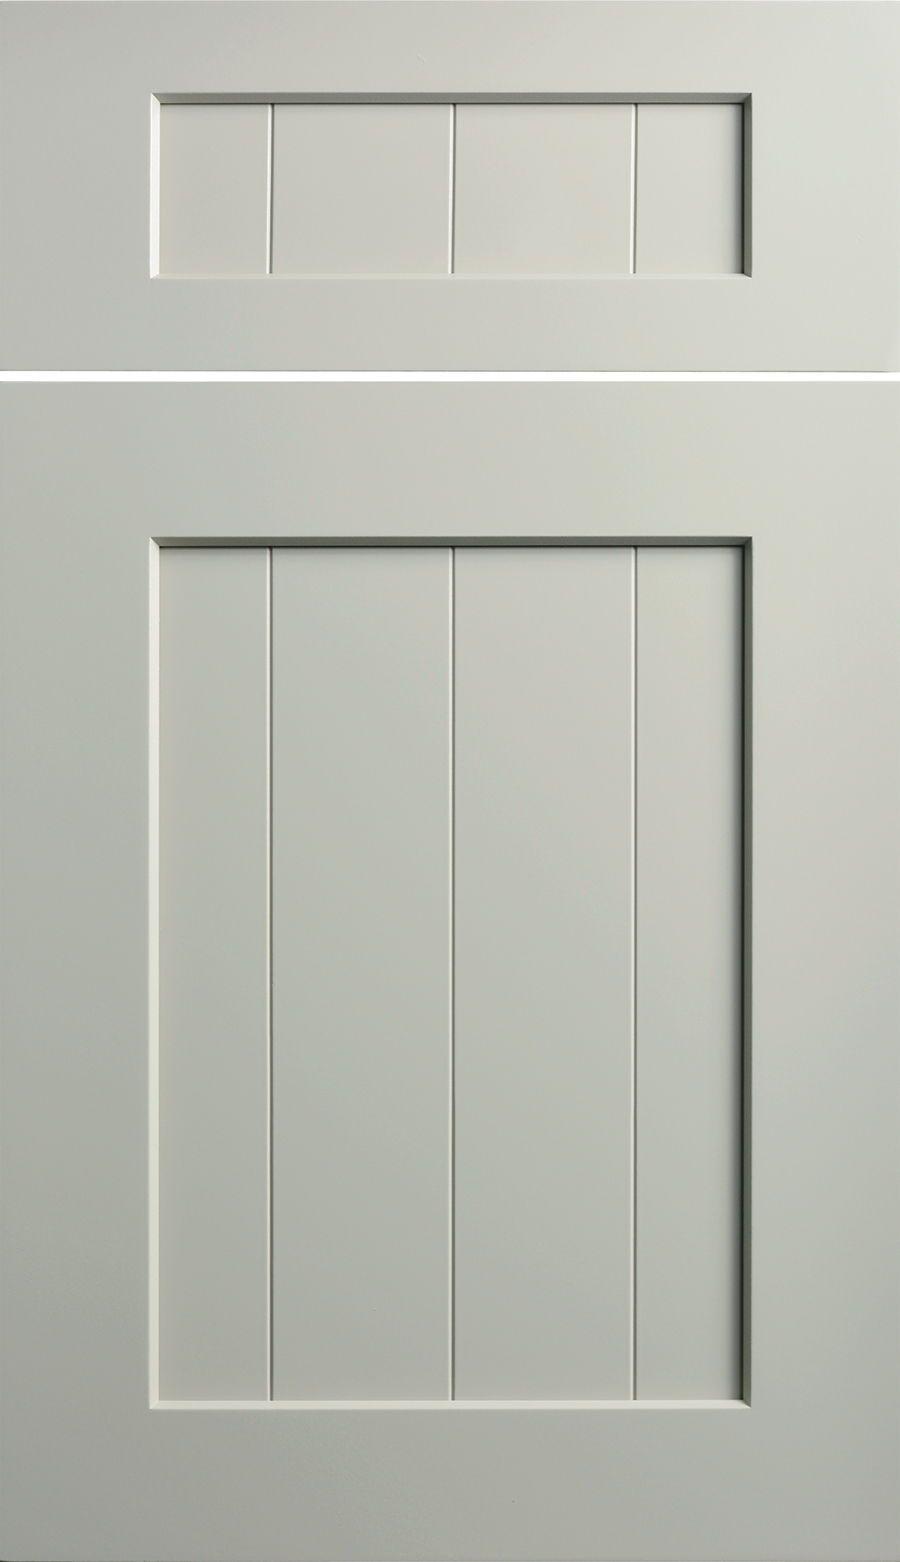 V Groove Cabinet Doors Door Inspiration For Your Home